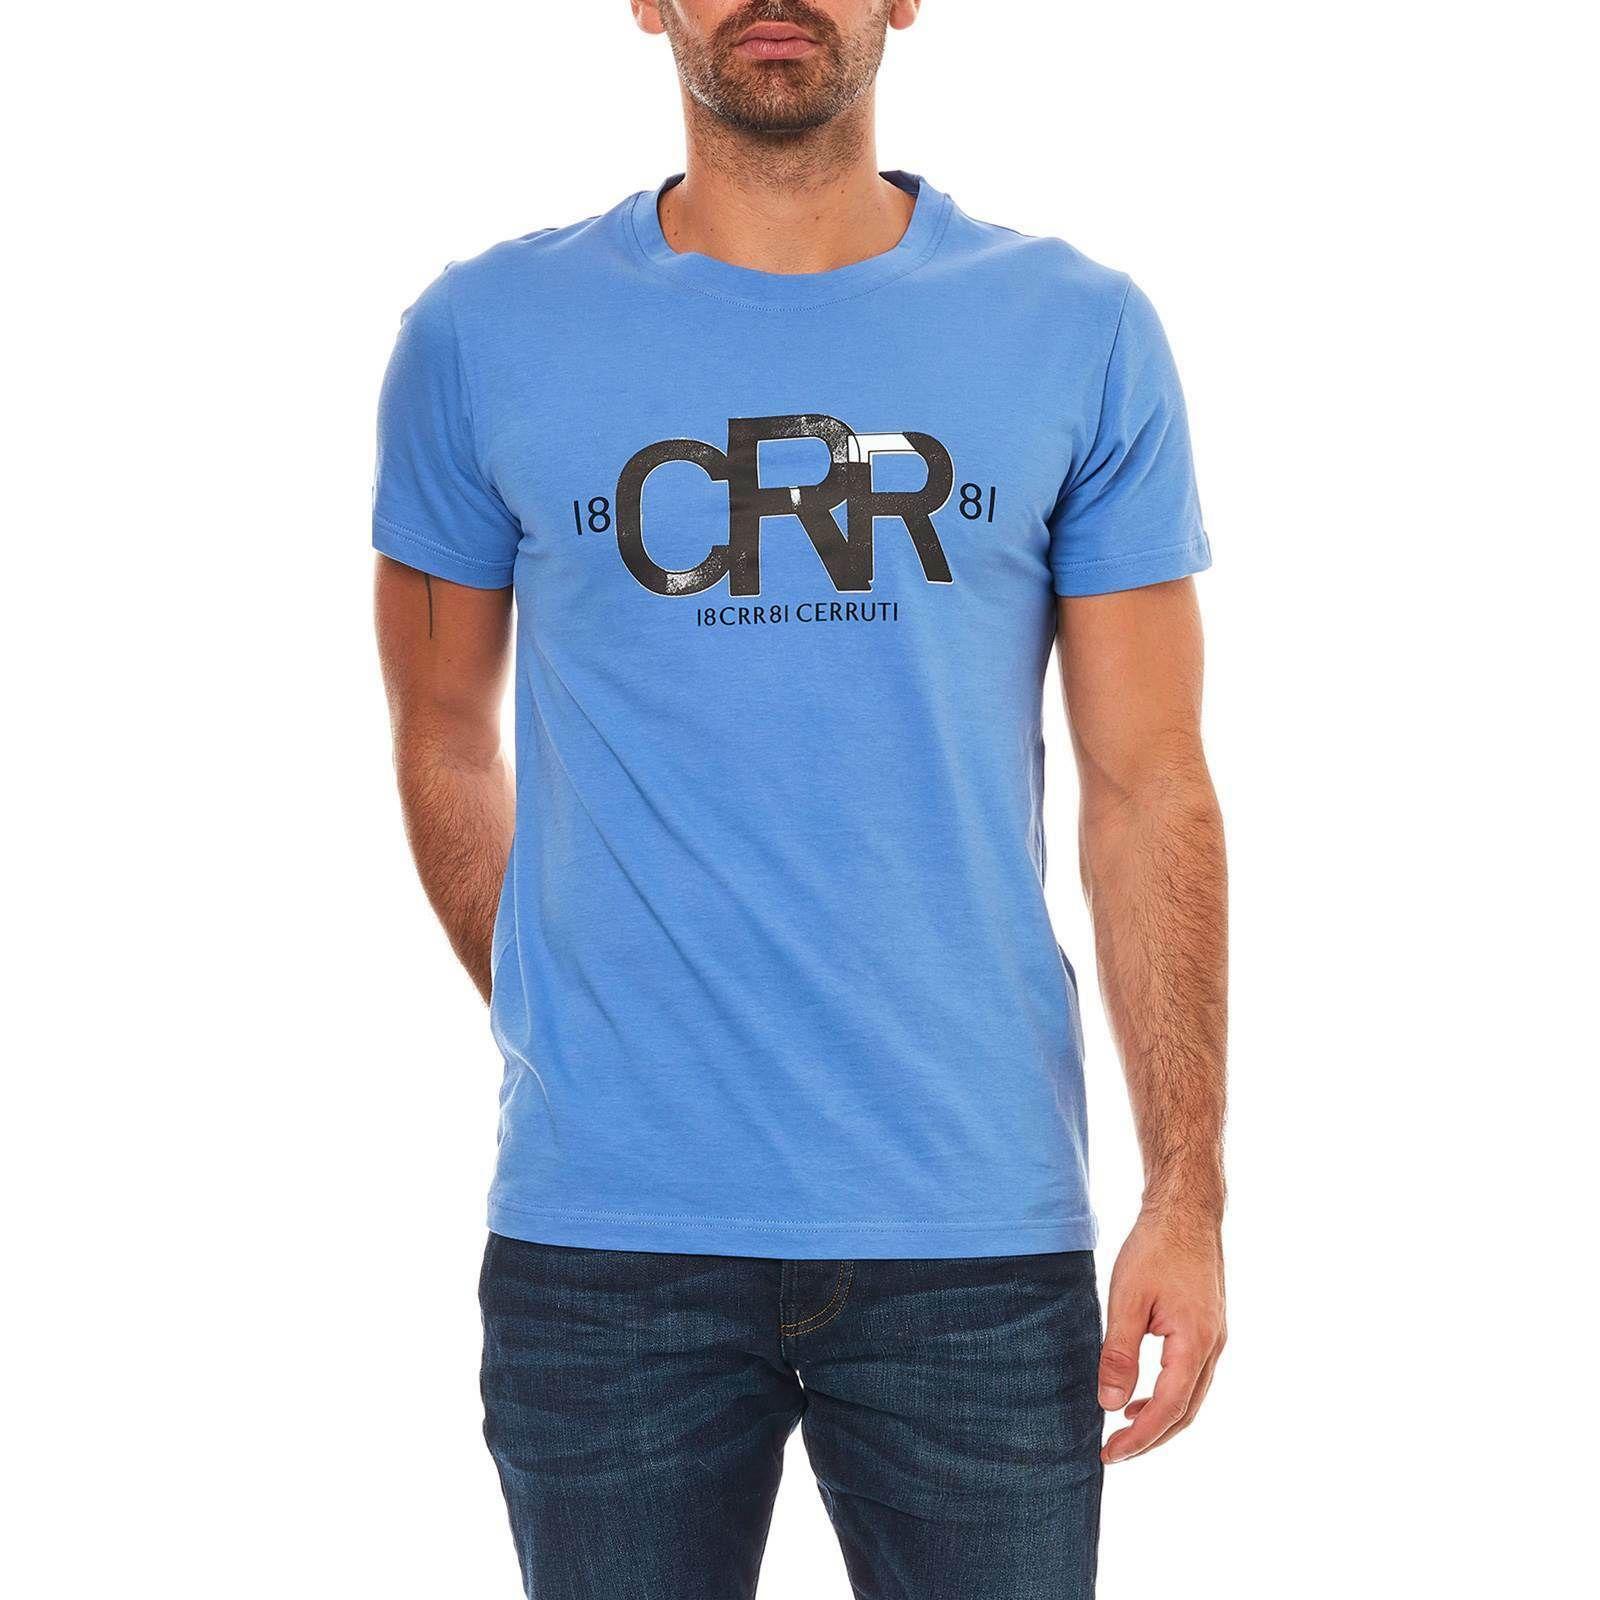 6b841c31539 Cerruti 1881 Camiseta De Manga Corta Azul Funny Unisex Shirts And Tshirts  Tee Shirts Sale From Fastshipdirect, $12.96| DHgate.Com